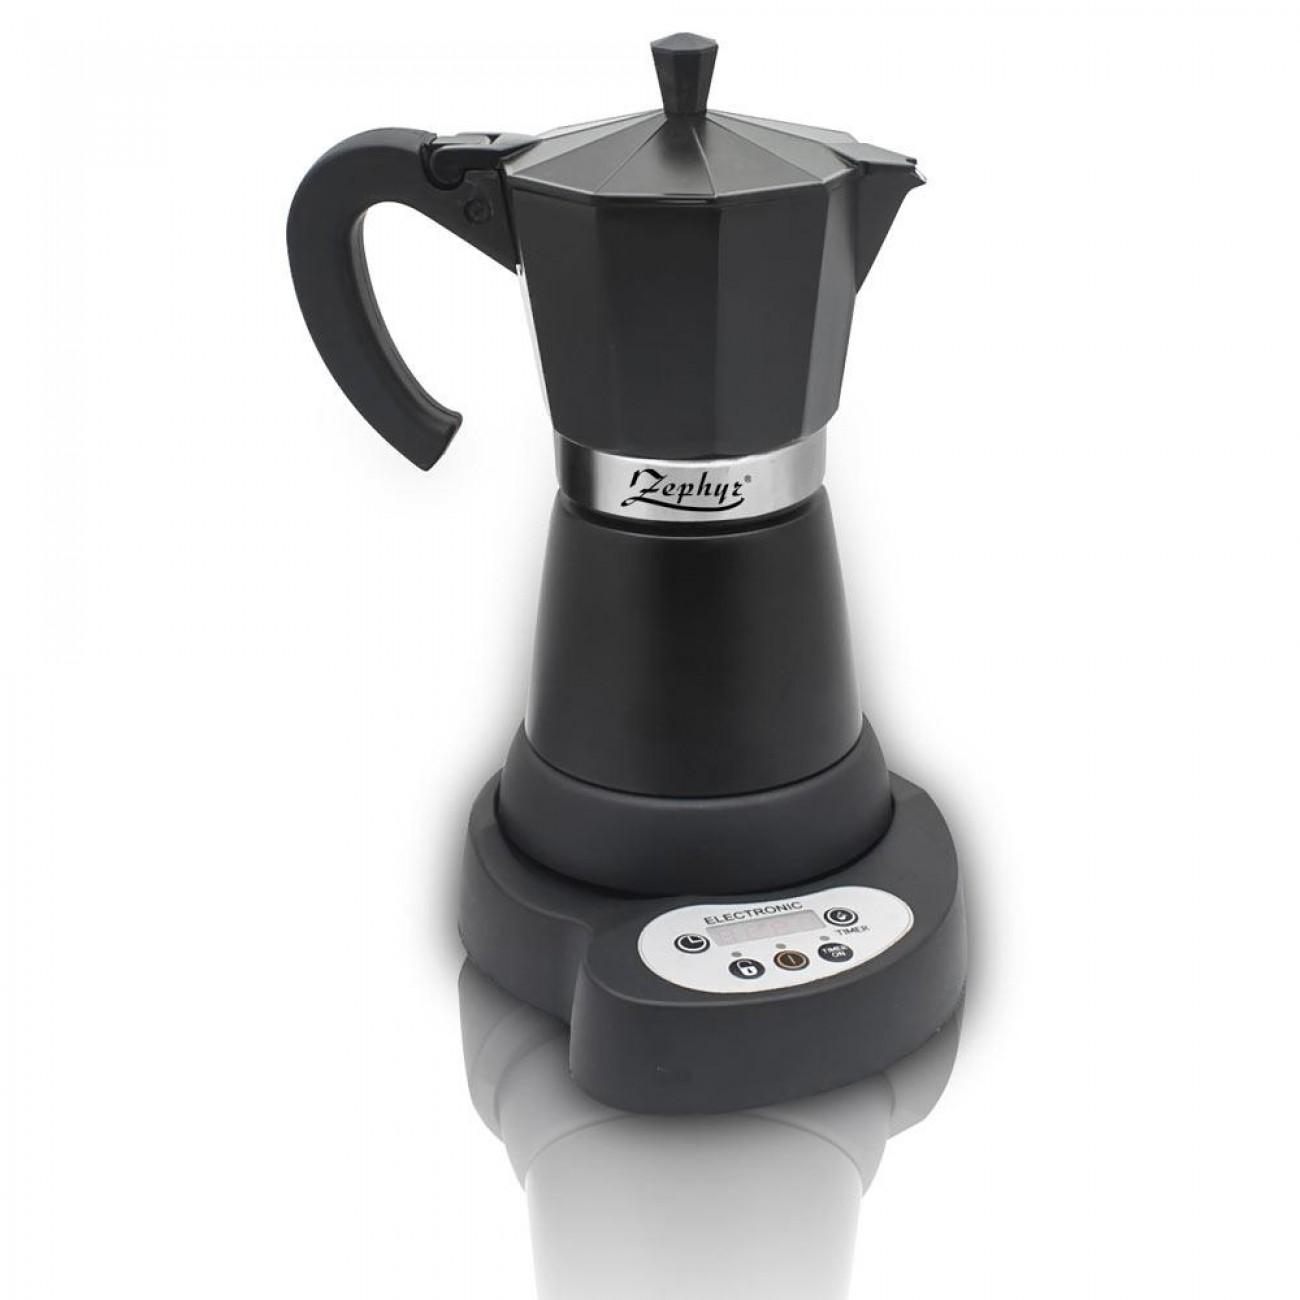 Електрическа кубинска кафеварка ZEPHYR ZP 1175 C6, 480W, Черна в Кафеварки за котлон - ZEPHYR | Alleop